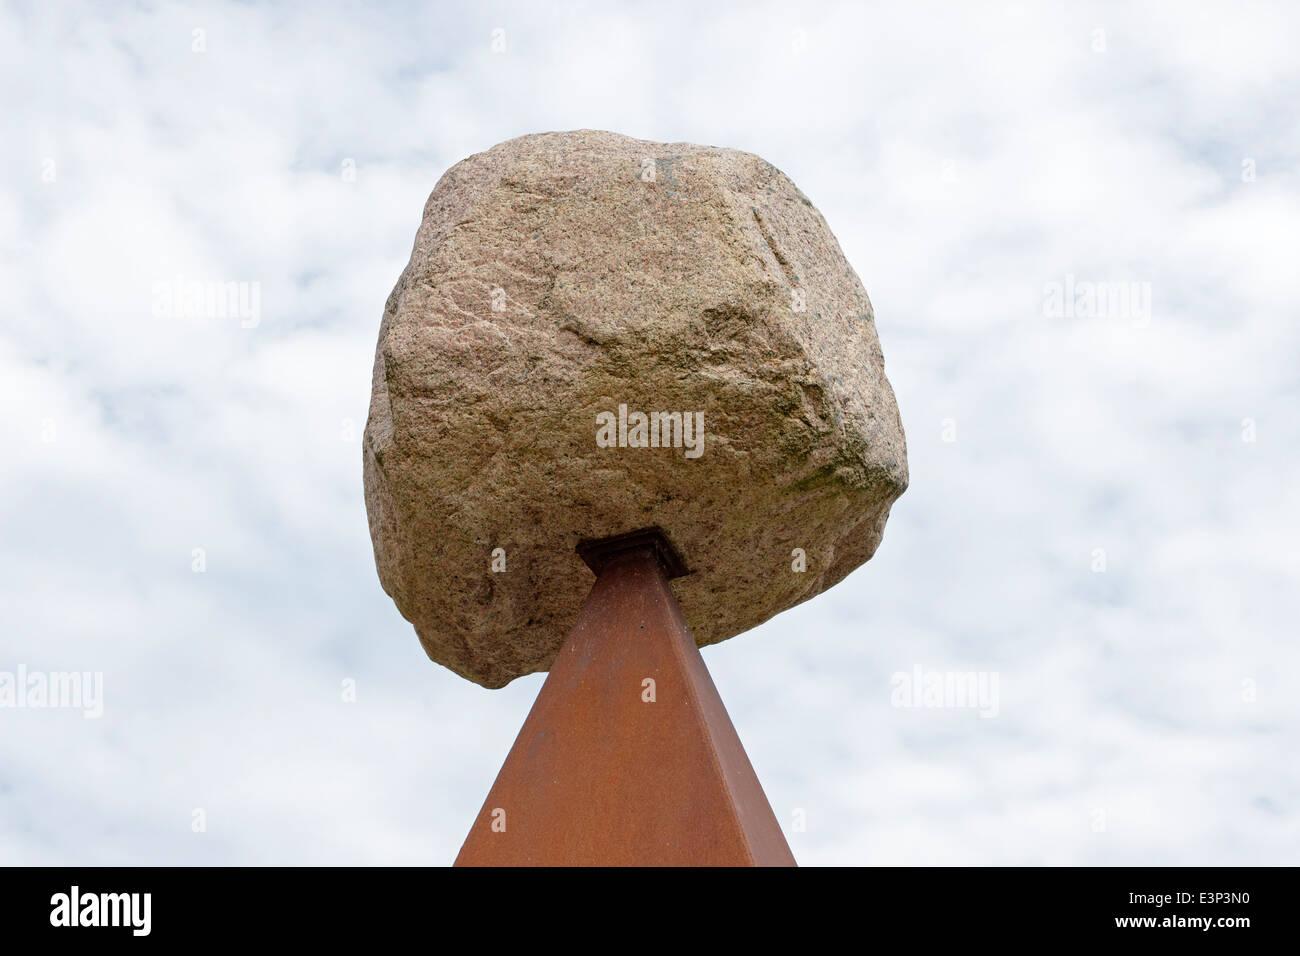 artwork with rock, Lauenburg, Schleswig-Holstein, Germany - Stock Image